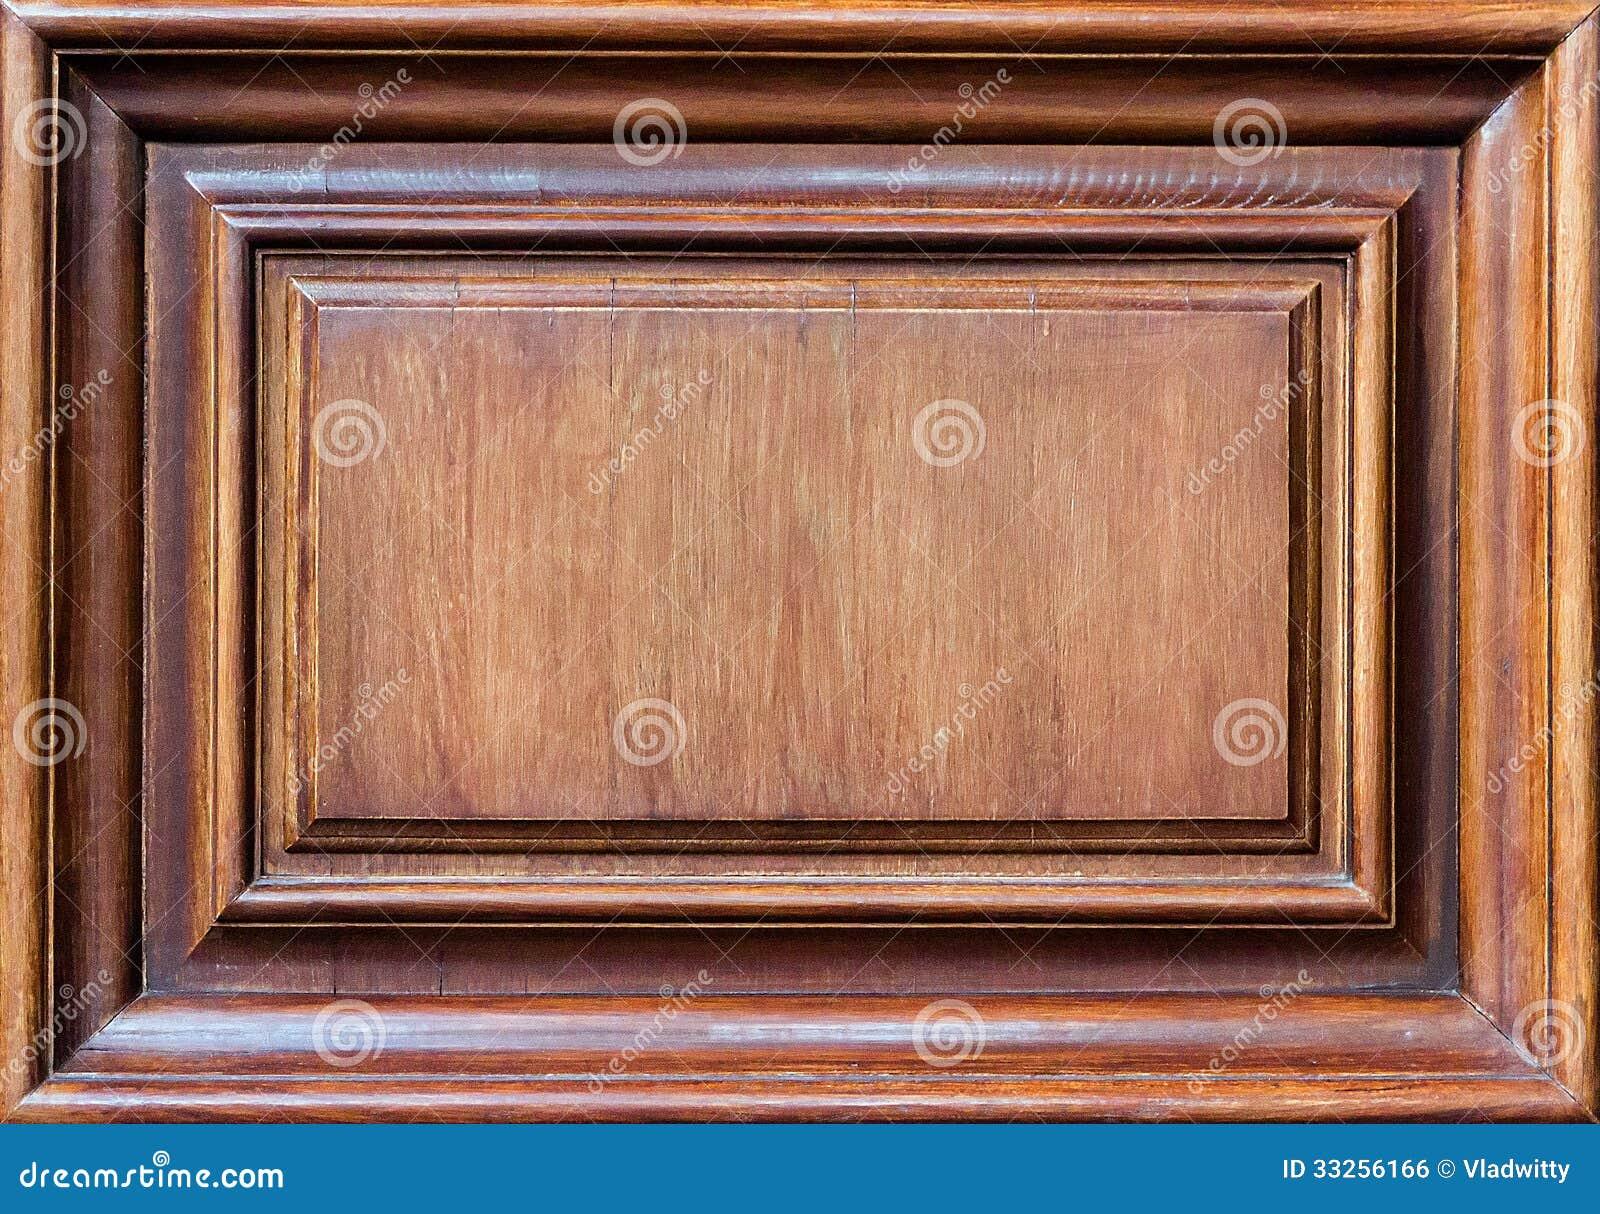 Holzrahmenwand stockfoto. Bild von retro, eleganz, rand - 33256166